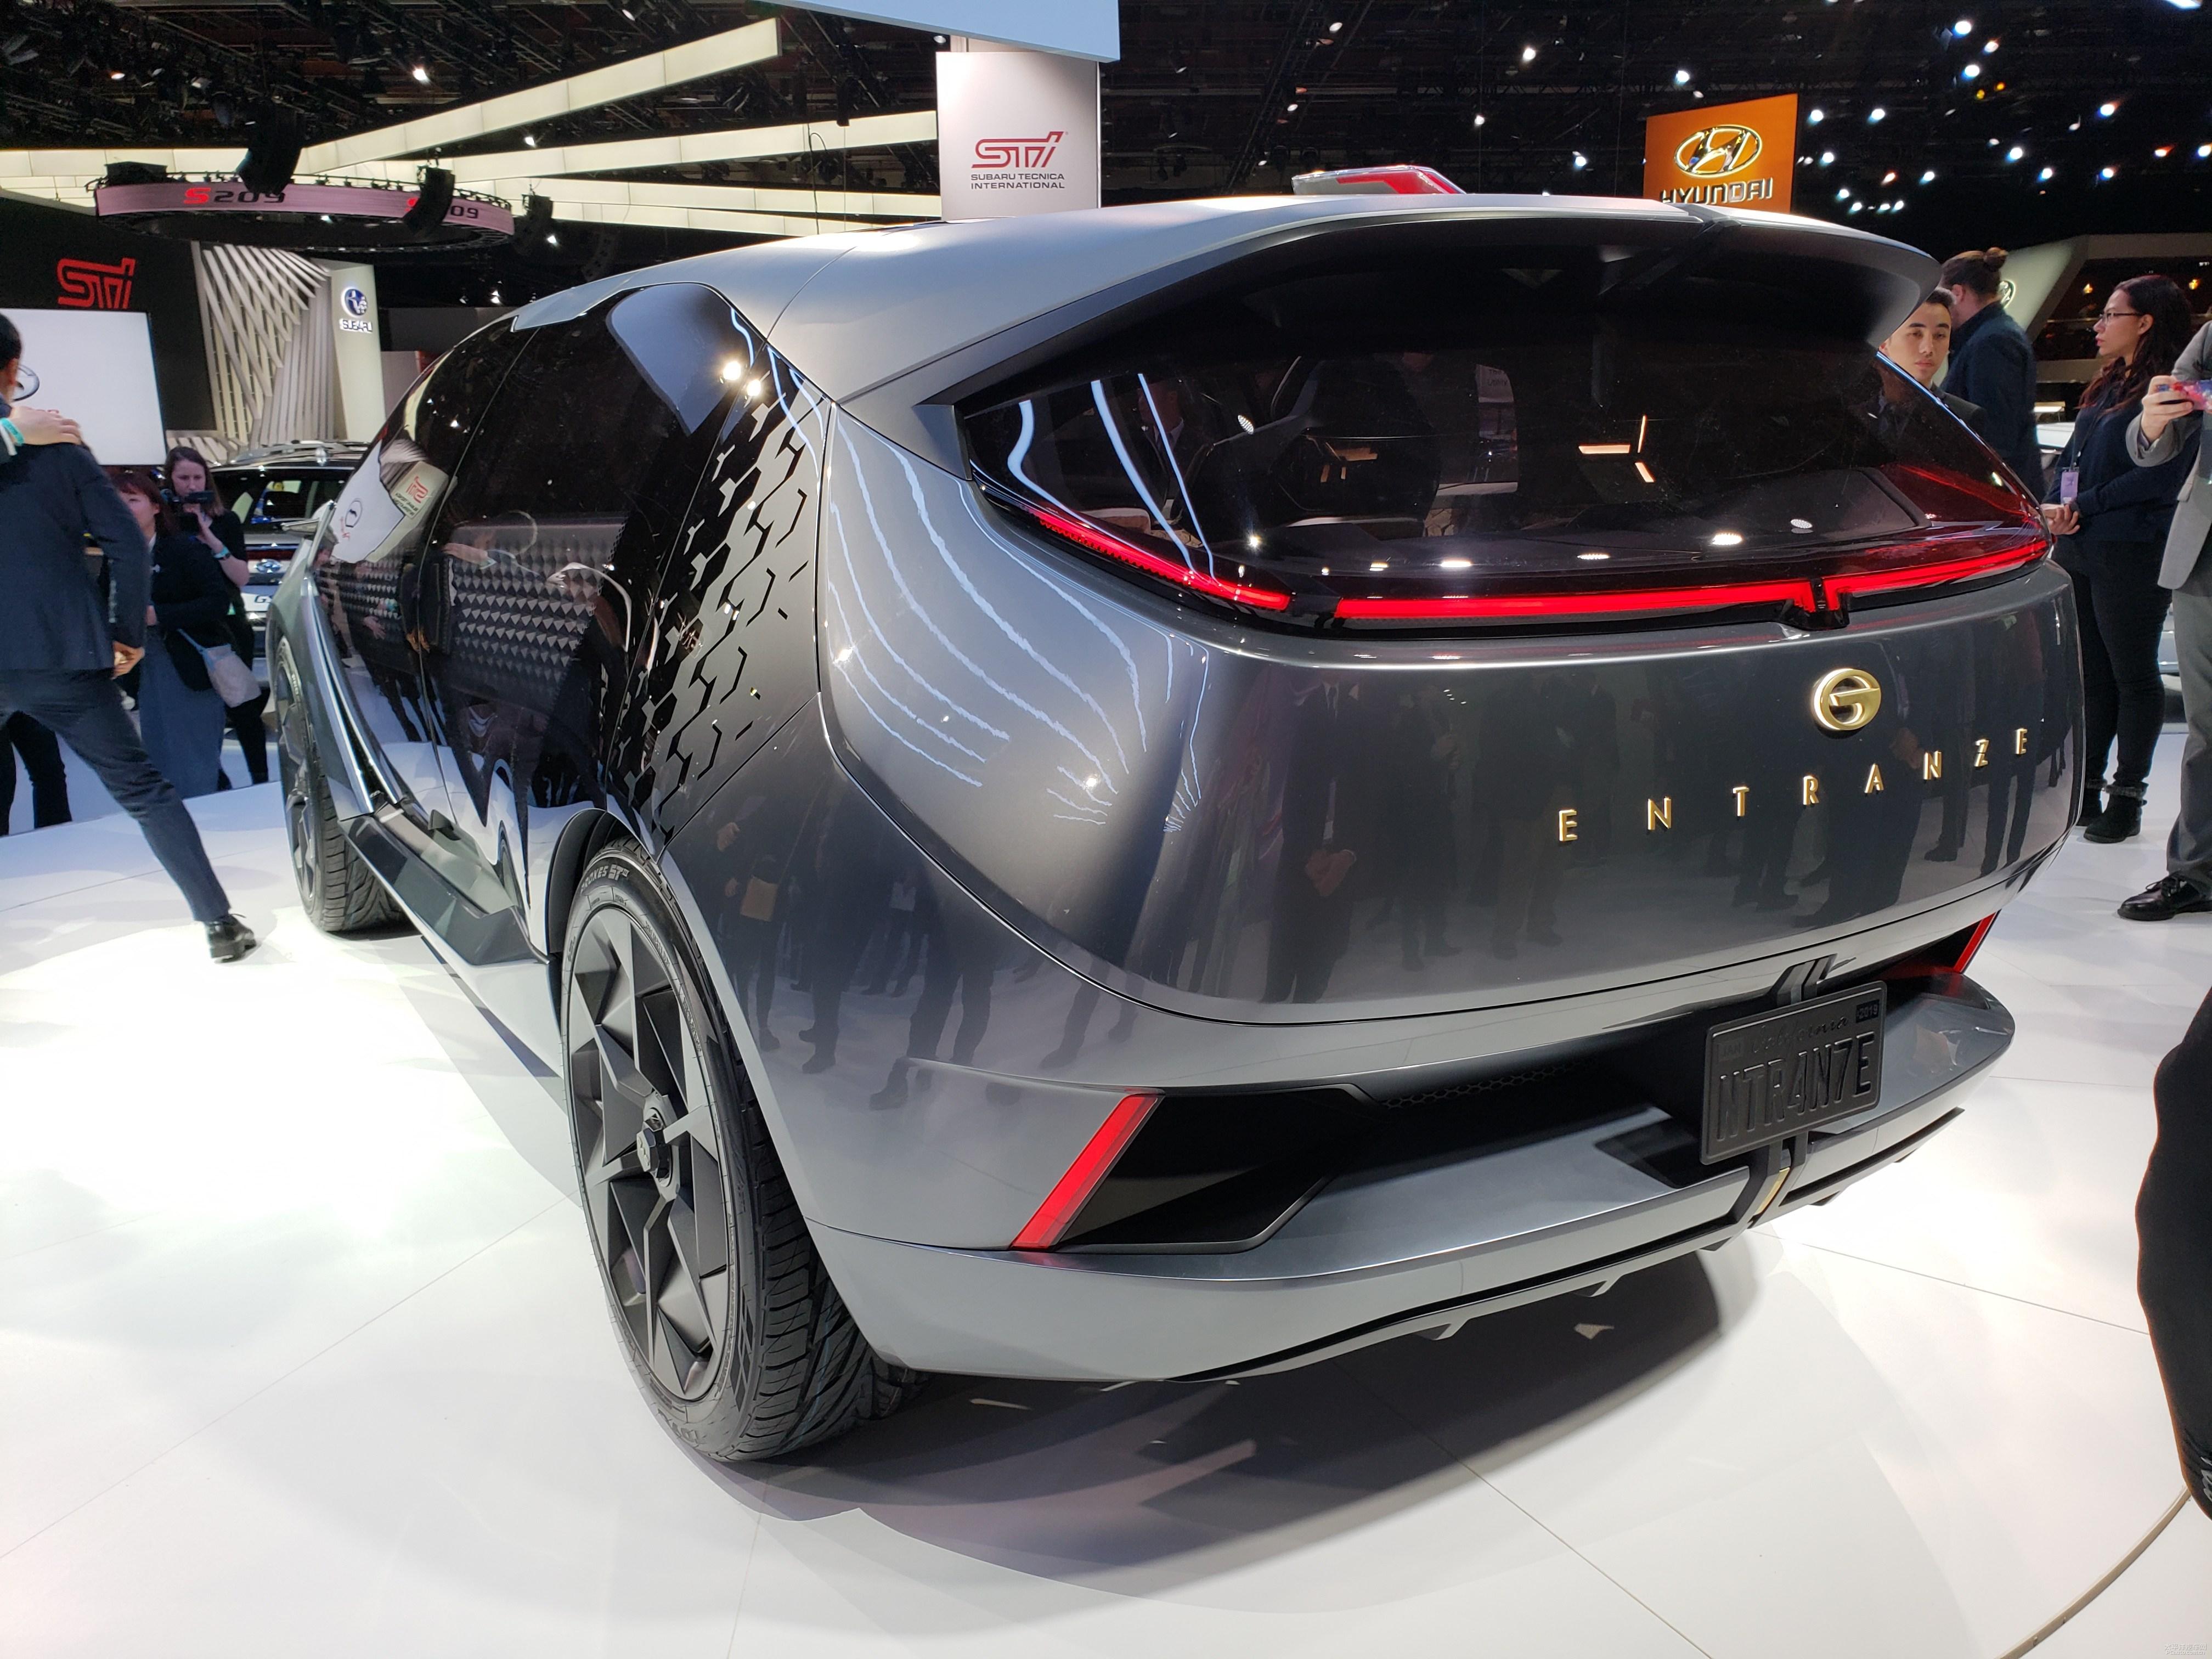 Spy Photo for New Trumpchi GA6, to Debut on 2019 Shanghai Auto Show as well as ENTRANZE Concept Car